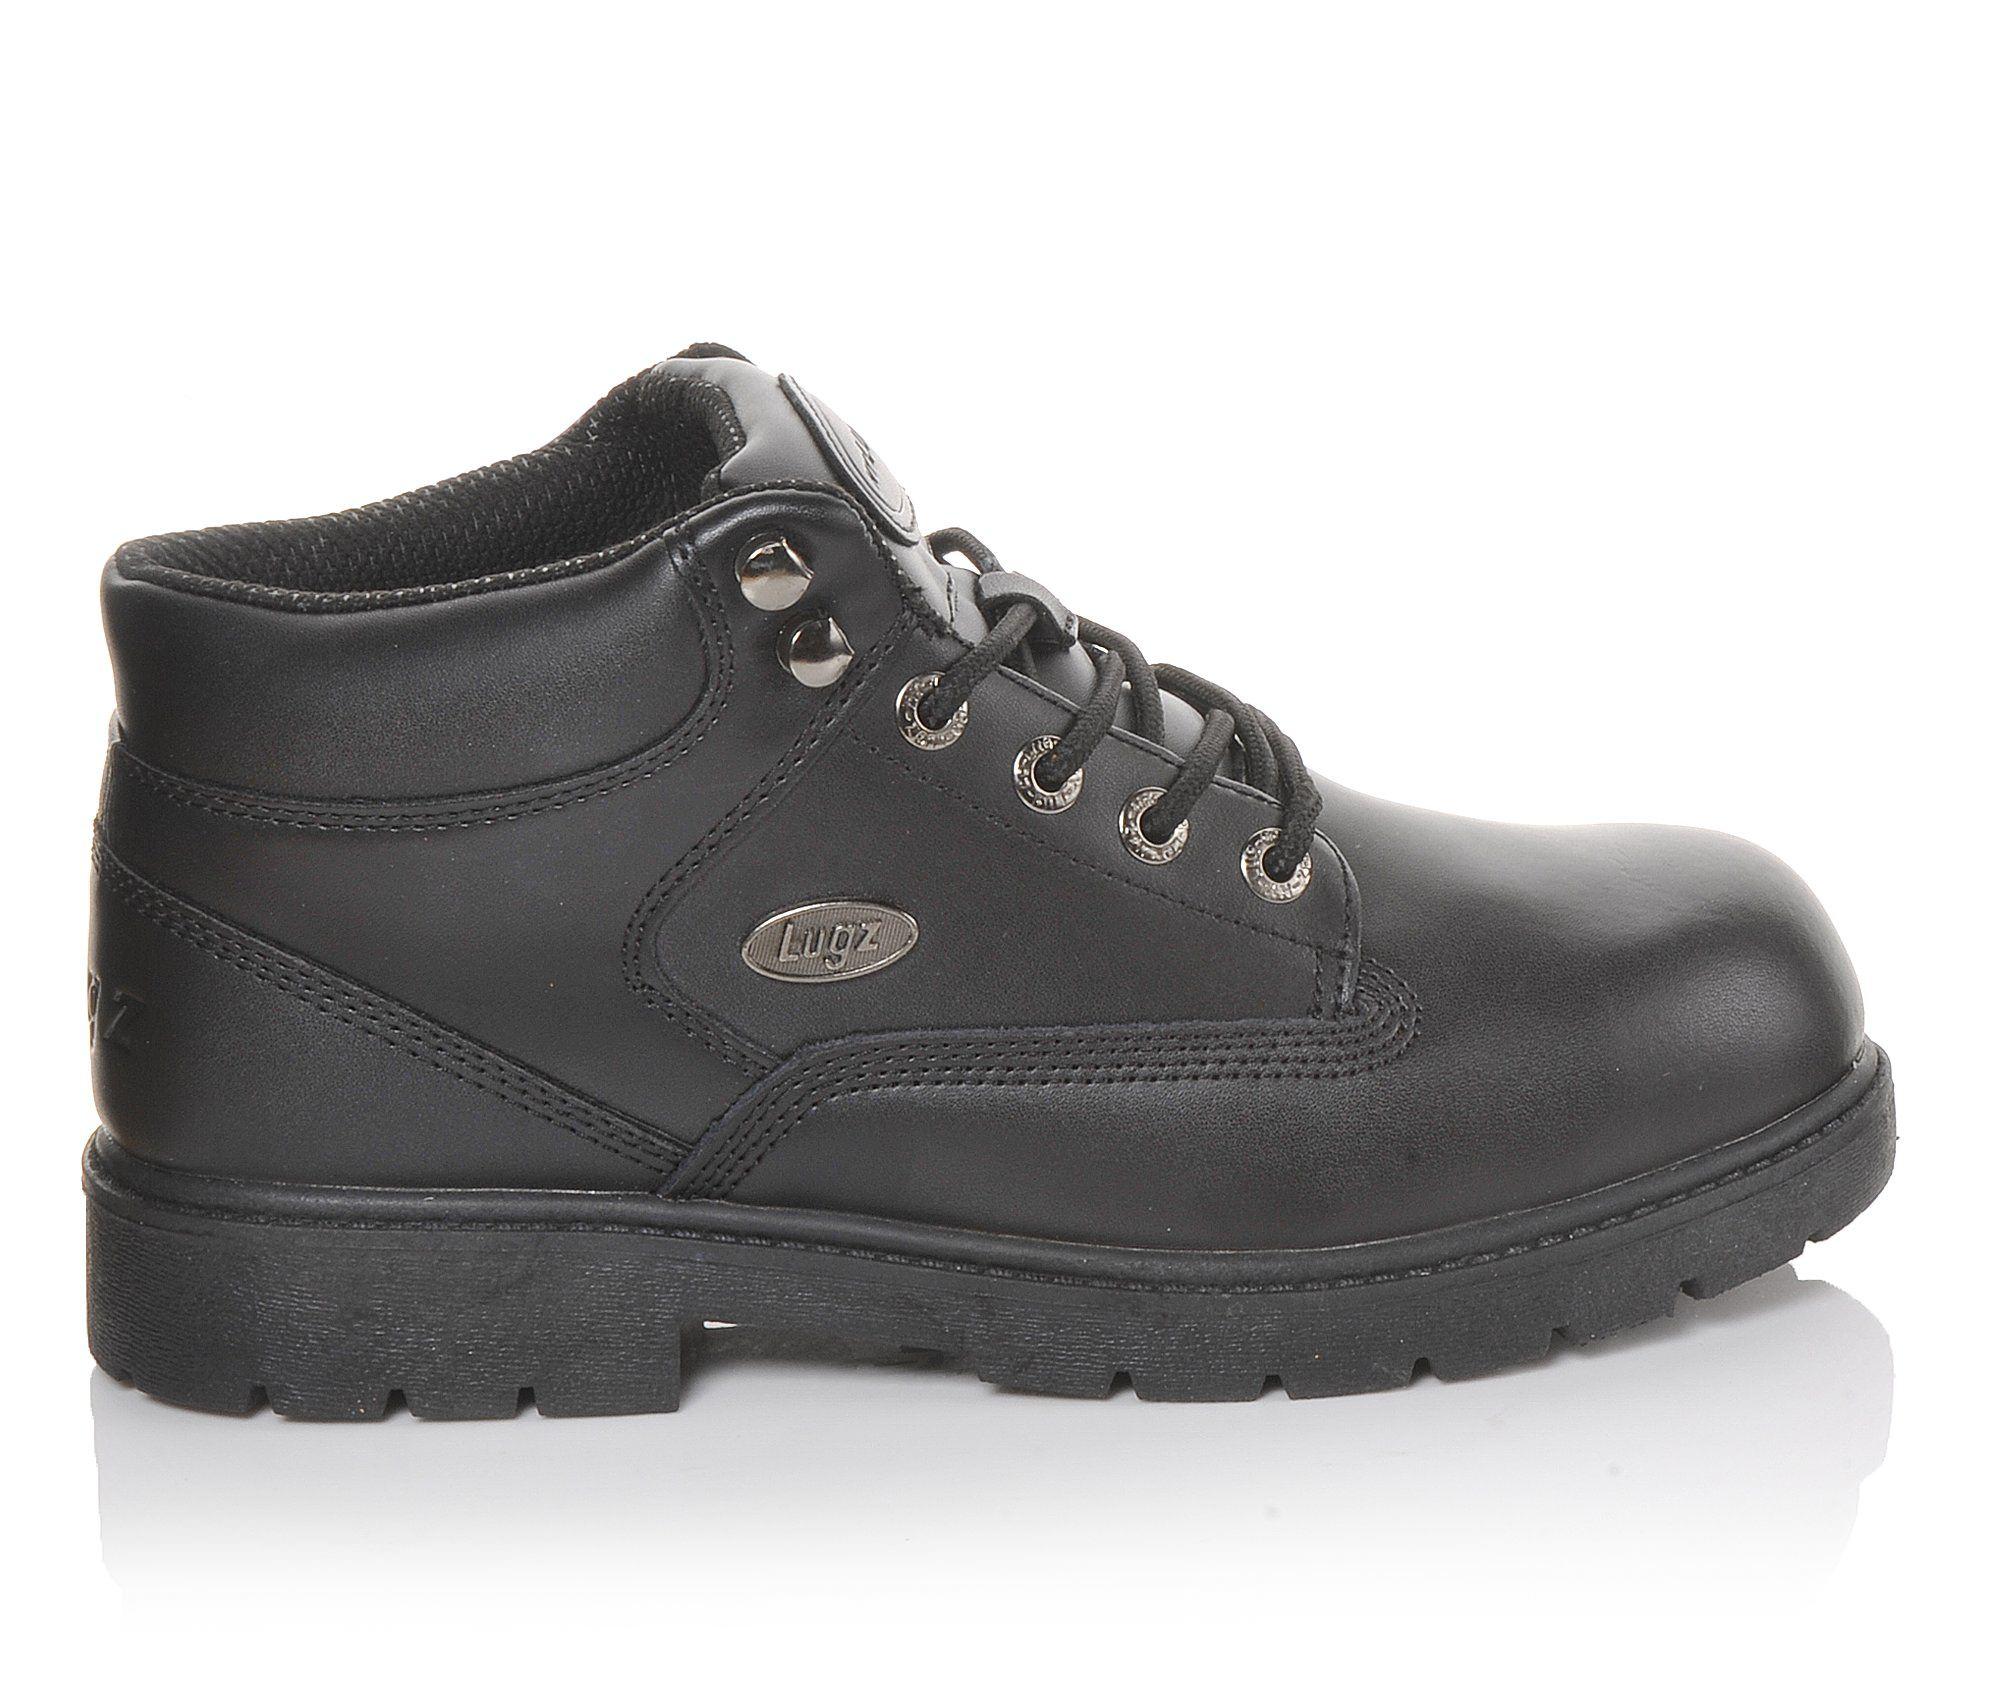 Lugz Zone Hi Slip Resistant Men's Boots (Black Leather)